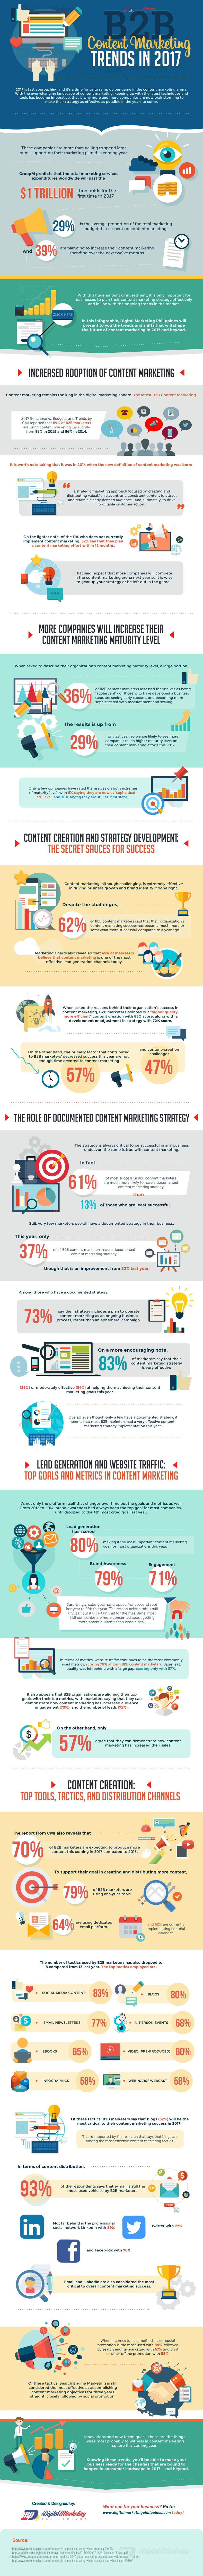 Blogs Among Top B2B Marketing Tactics for 2017